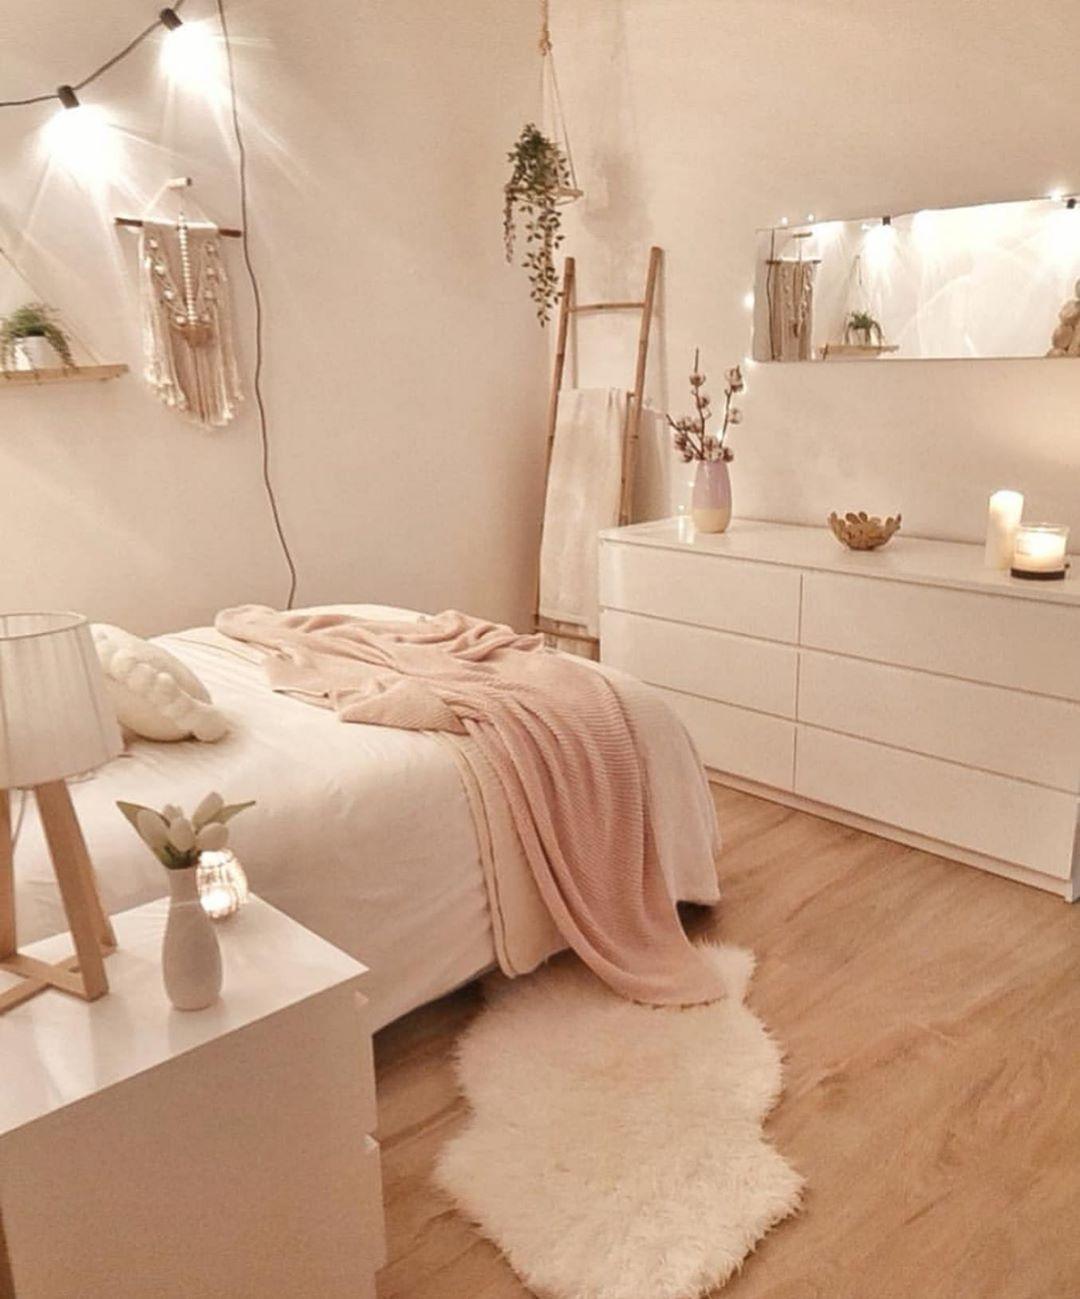 "Room For Girl Interior Inspo on Instagram: ""Lovely bedroom 🌸💕 Double tap to 💗! Credit: @sandradeco__sweet_home —————————————— #roomforgirl #bedroomideas #girlsroom #bedroomdesign…"" #trendyblousedesigns #sariblousedesigns"